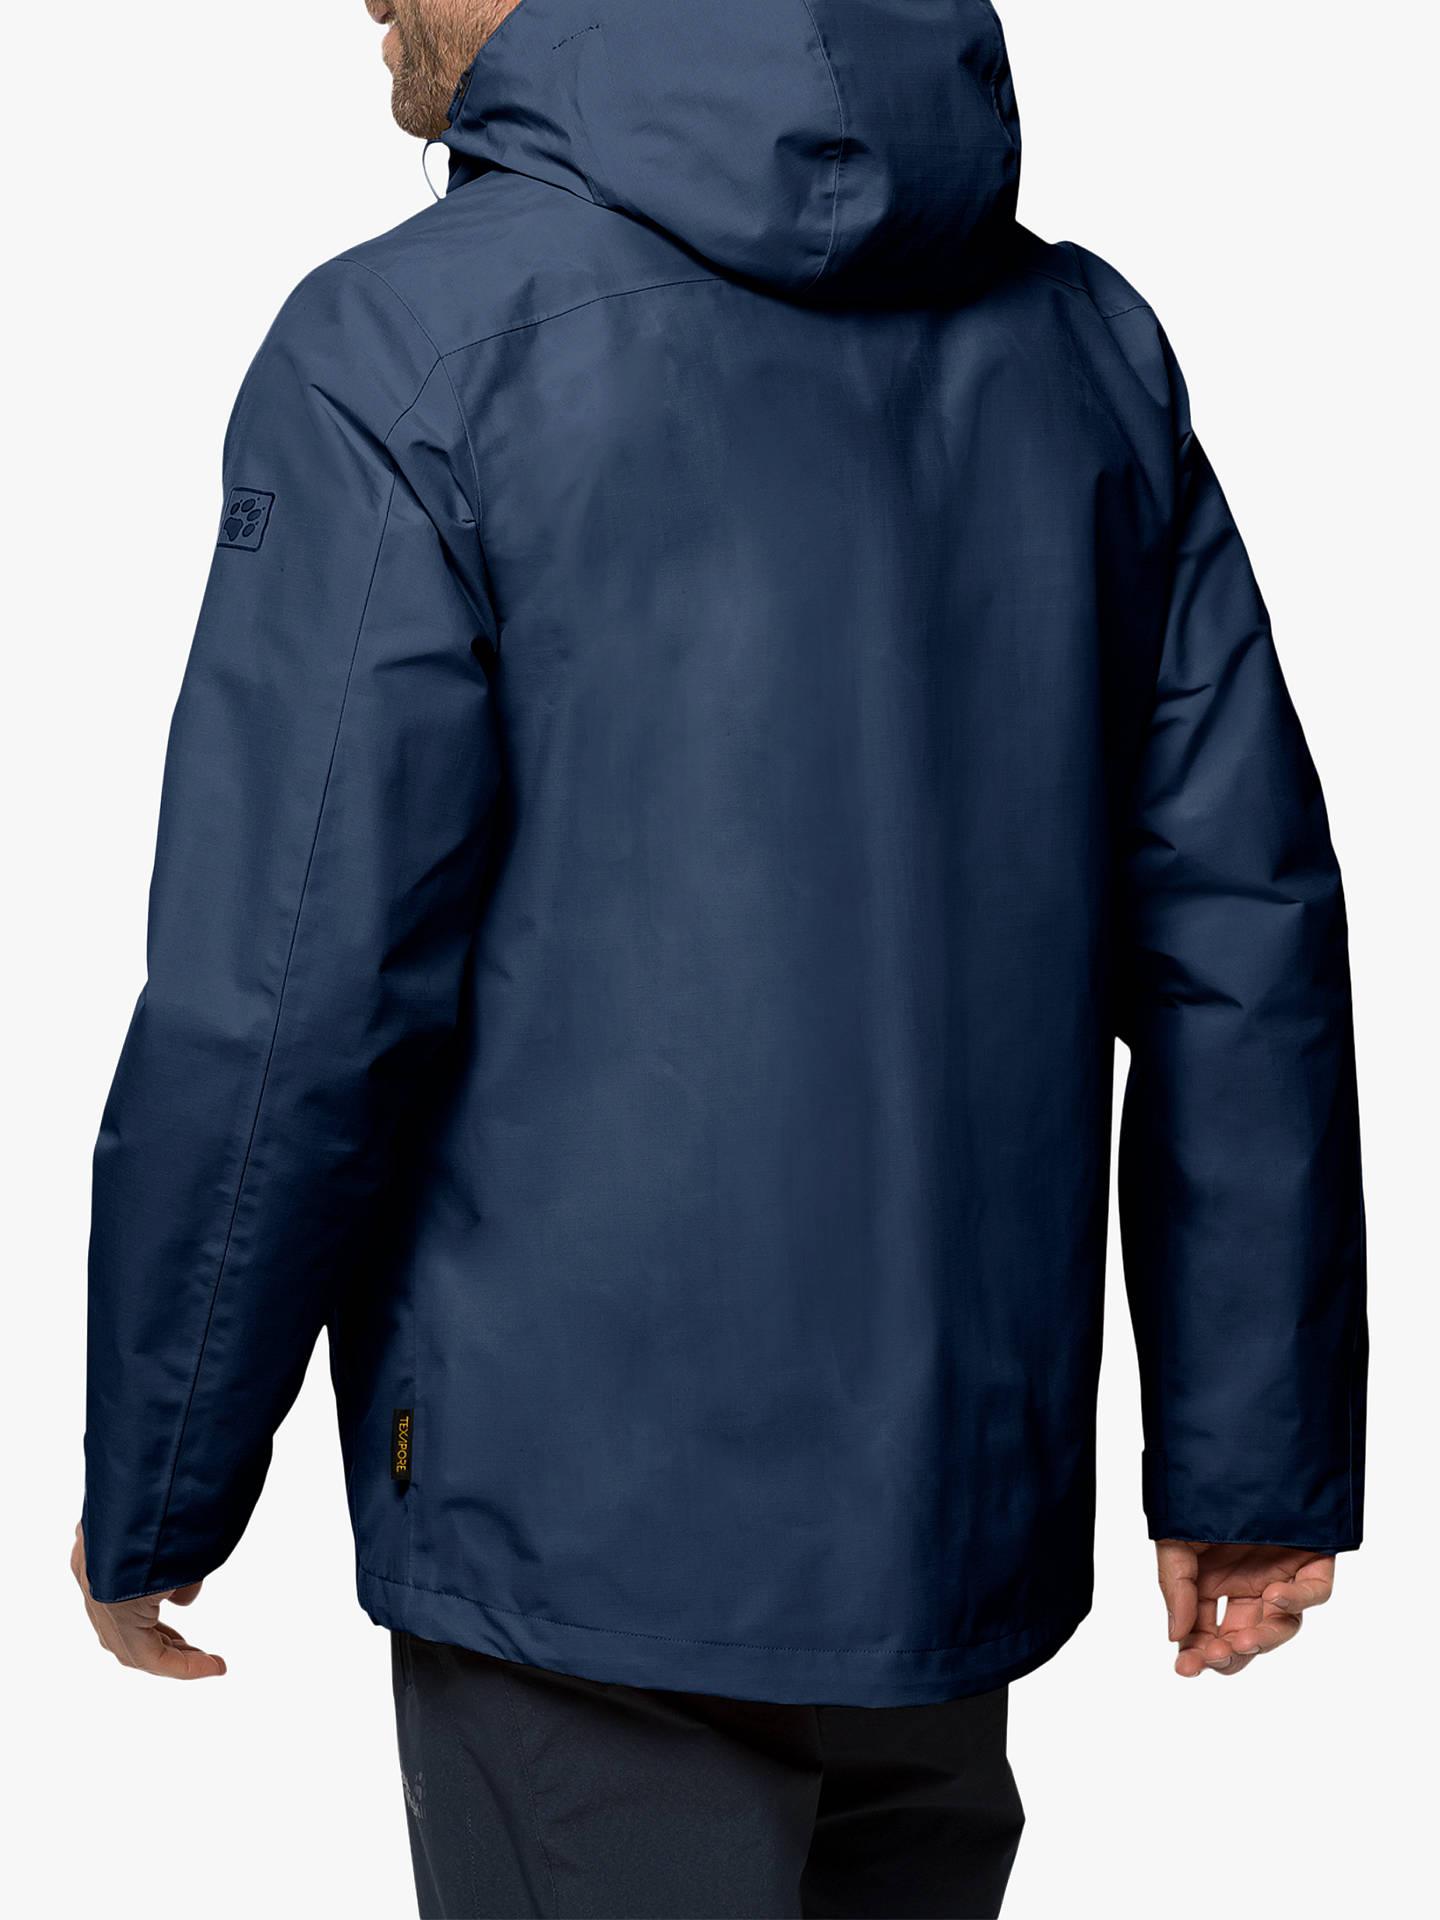 new product 9d4ad c492e Jack Wolfskin Gotland 3-in-1 Men's Waterproof Jacket, Dark Indigo